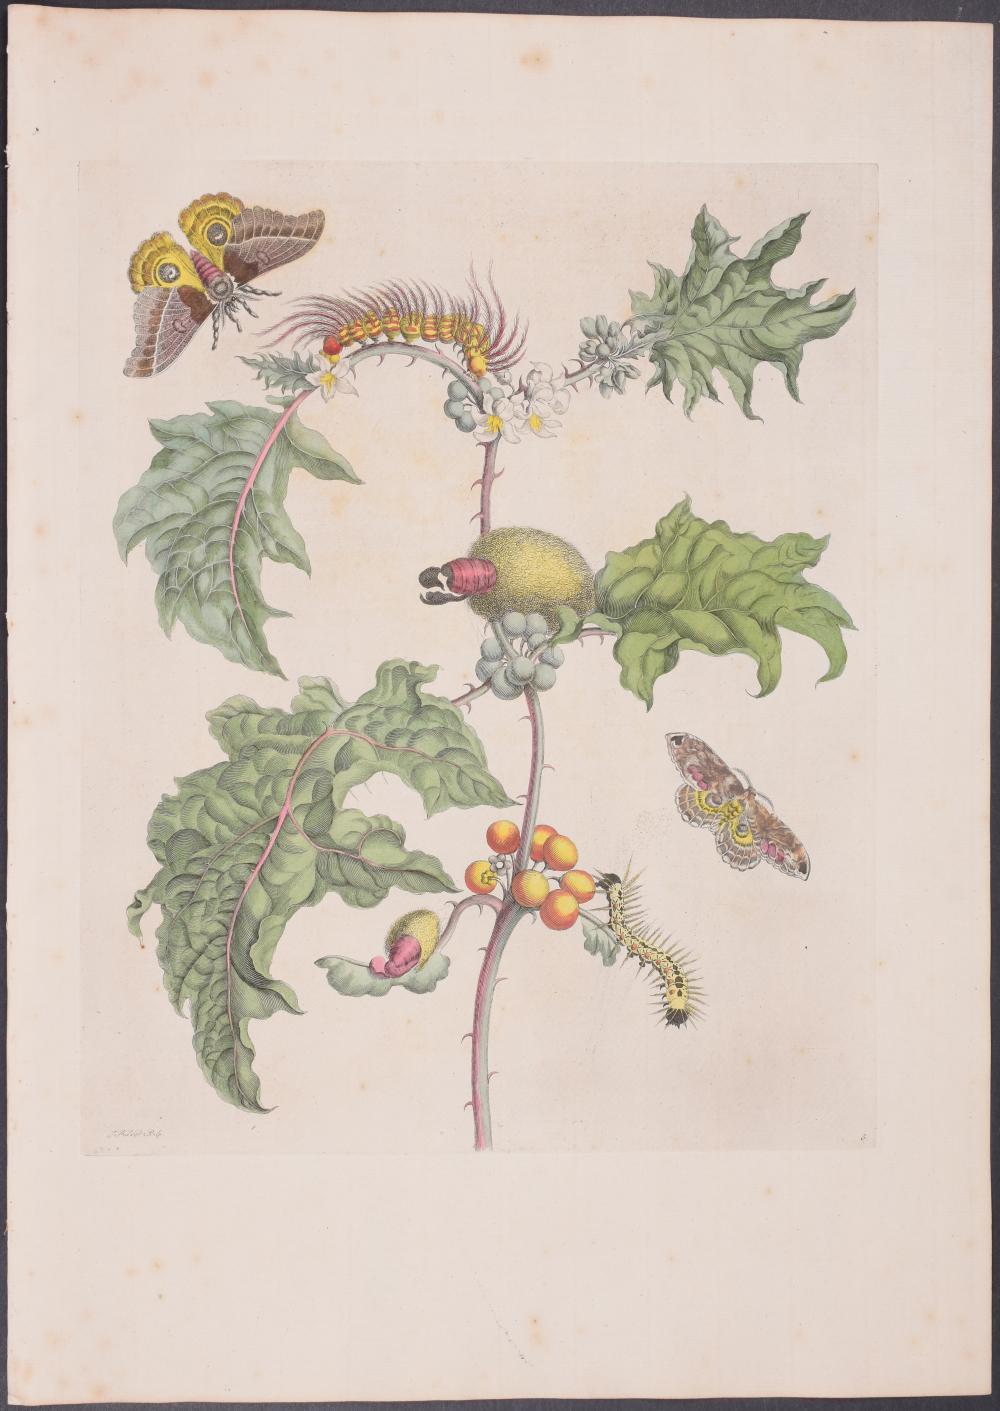 Lot 11184: Merian, Folio - Moth Metamorphosis. 6